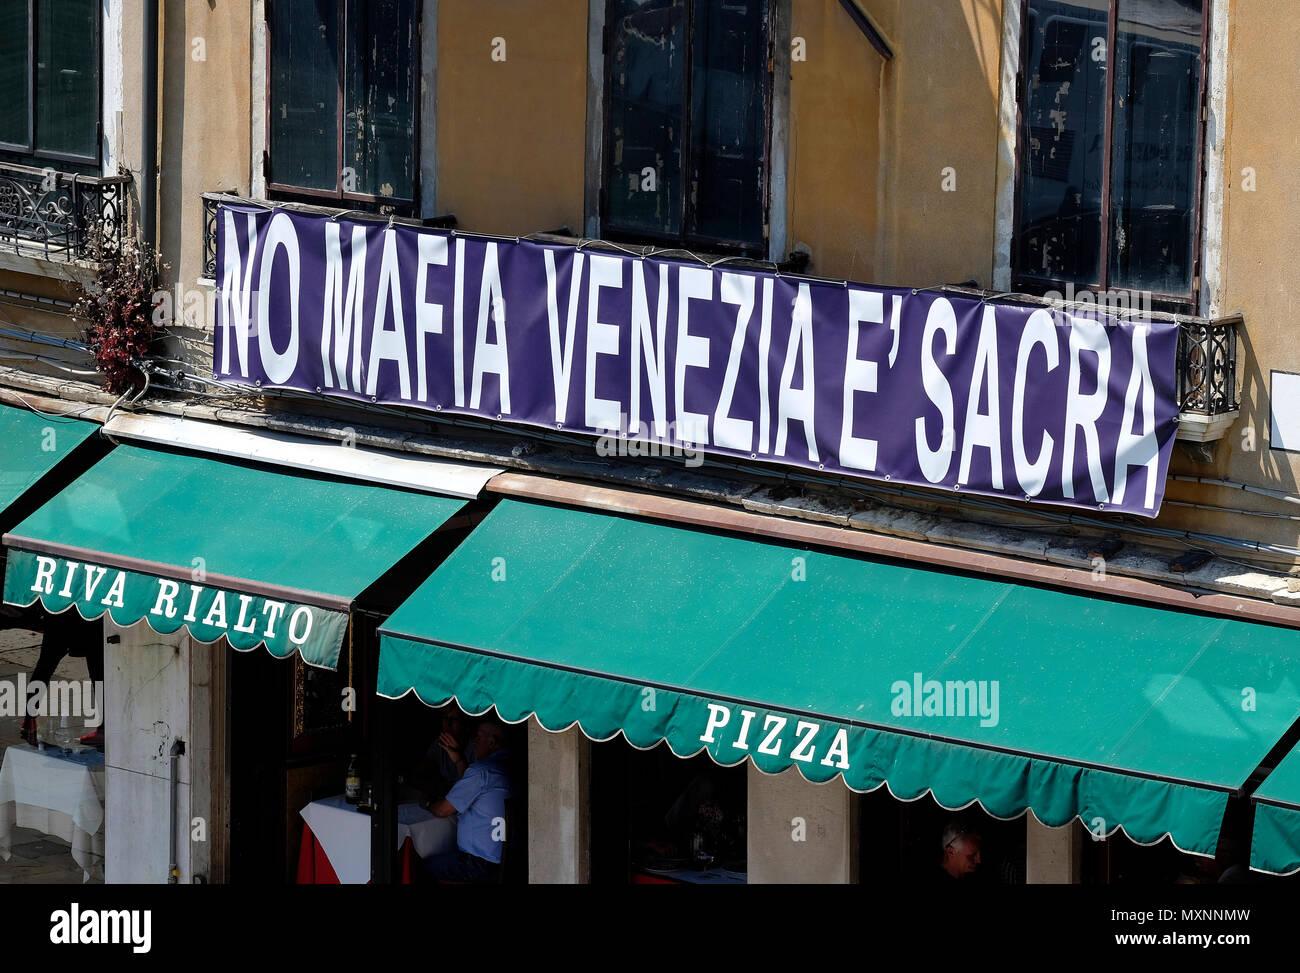 no mafia sign on building in venice, italy - Stock Image